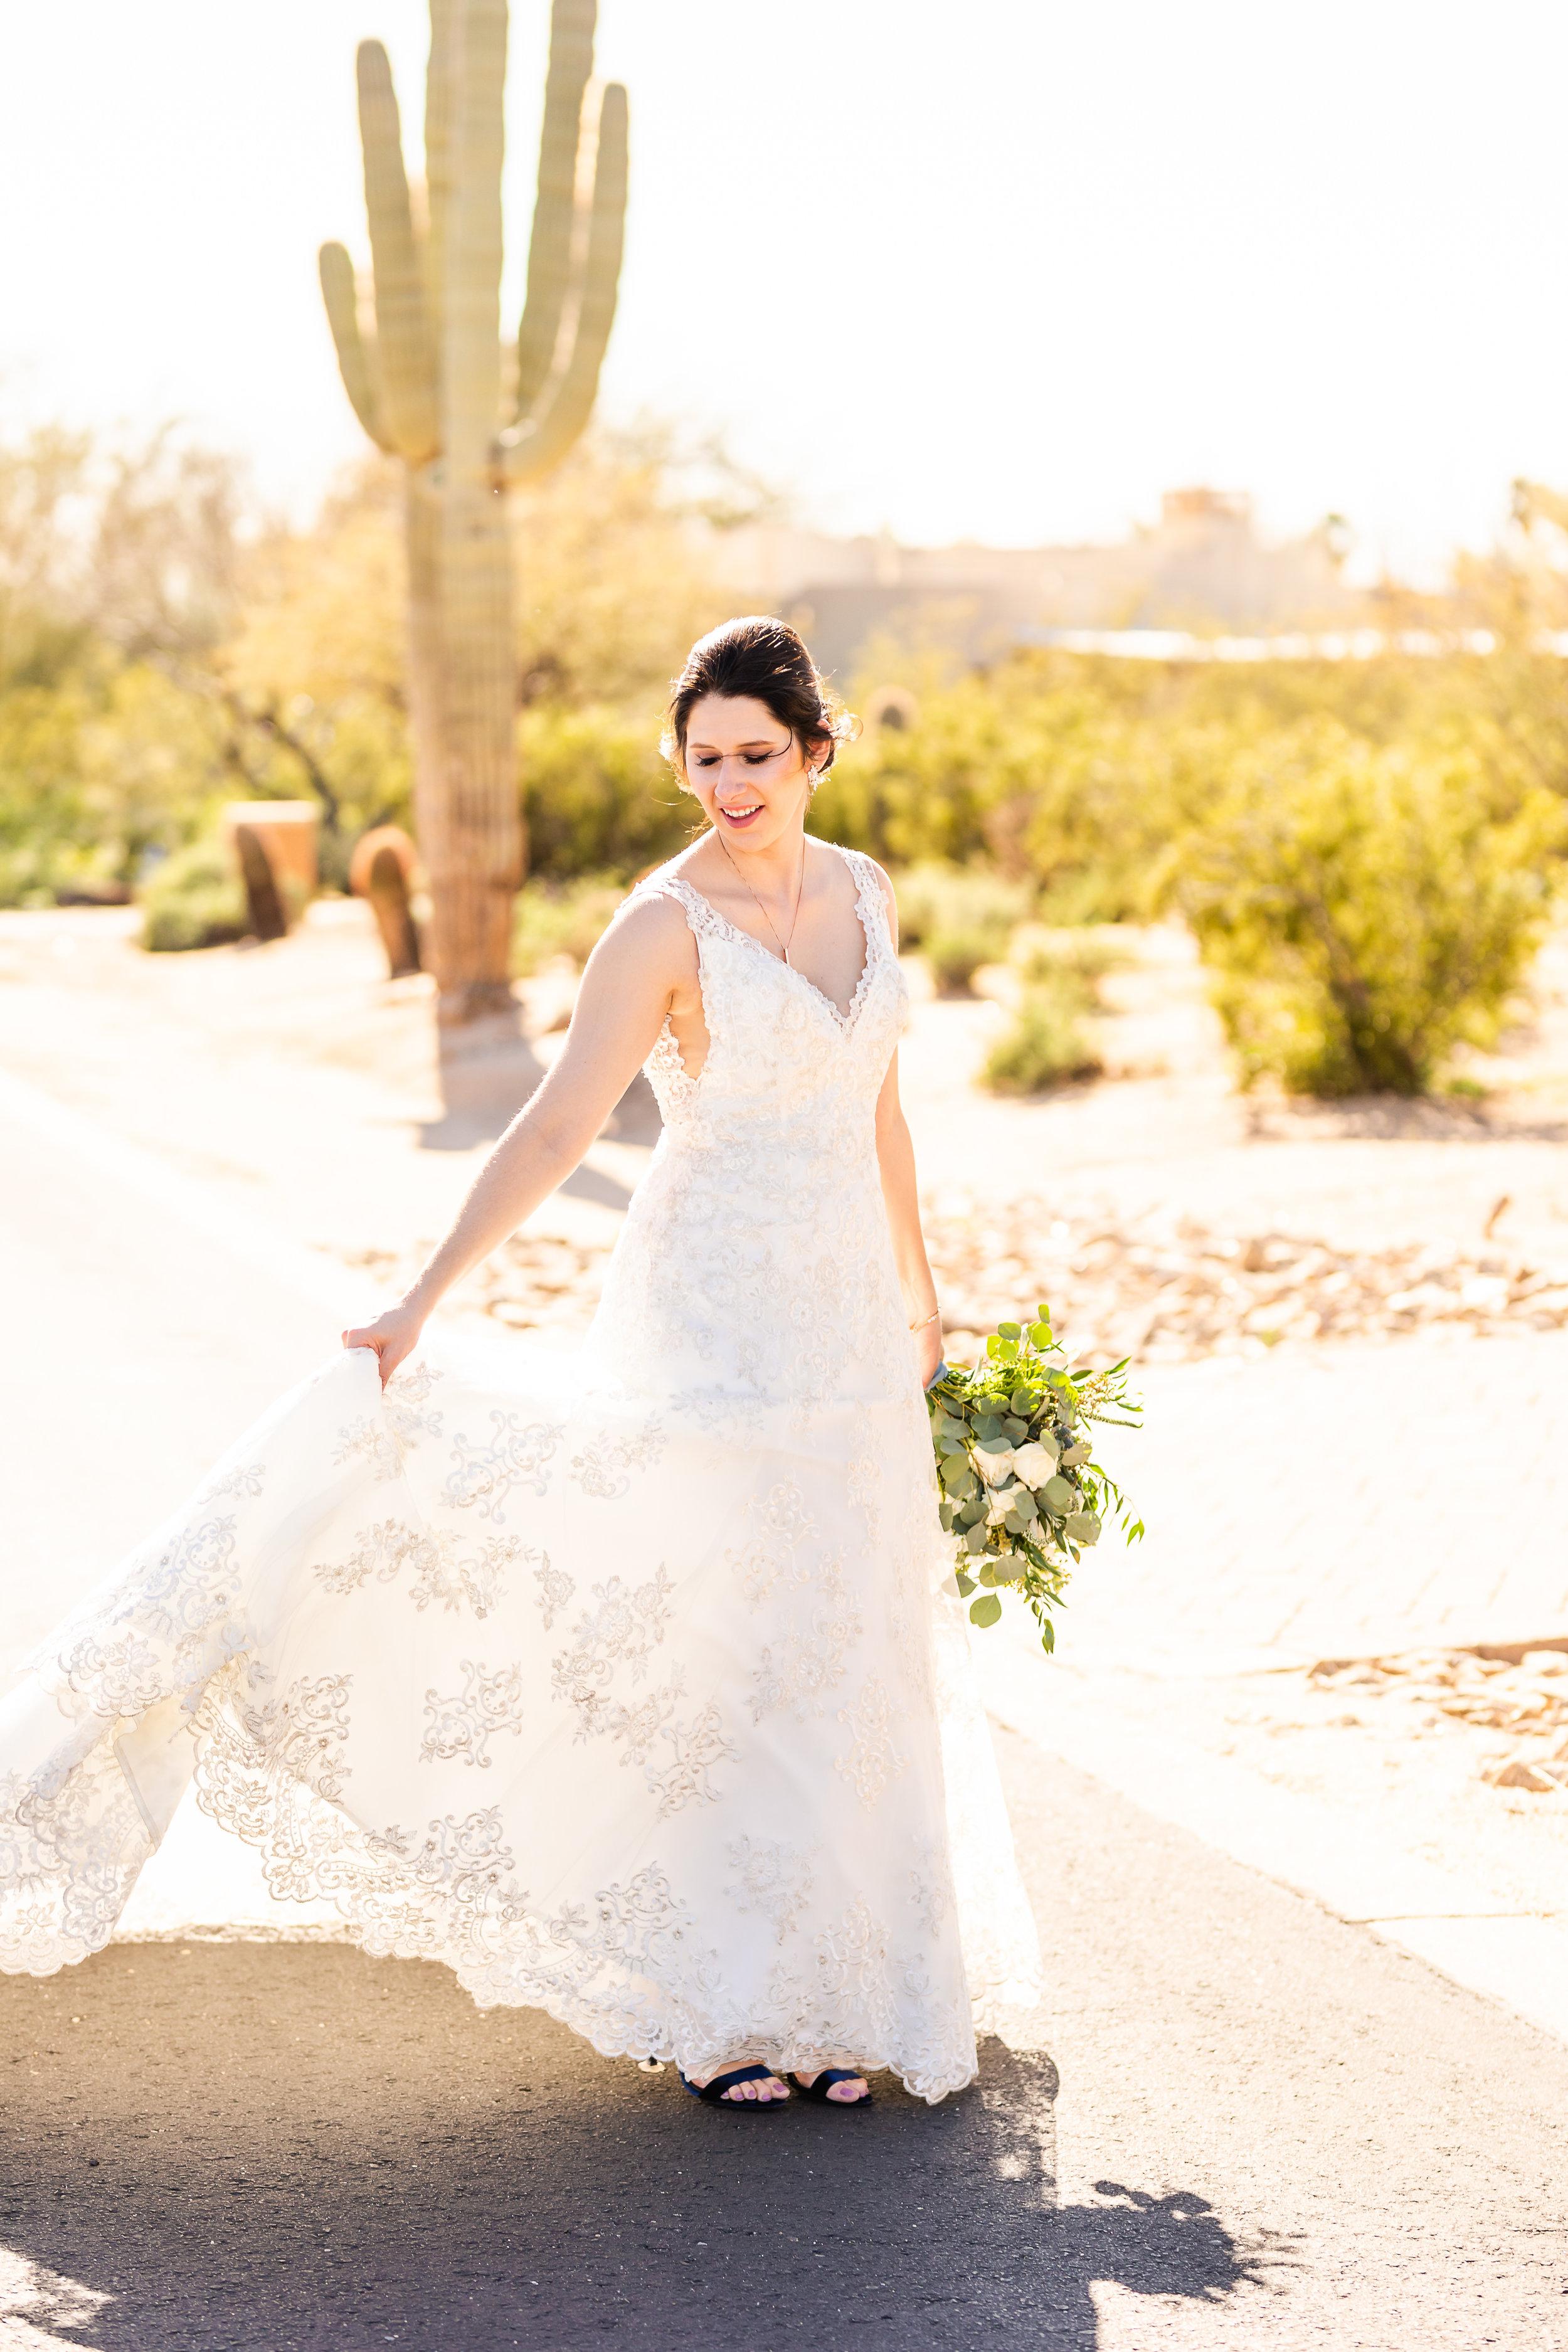 Jordan + Brent - Wedding - Mar2019 - Lunabear Studios-229.jpg